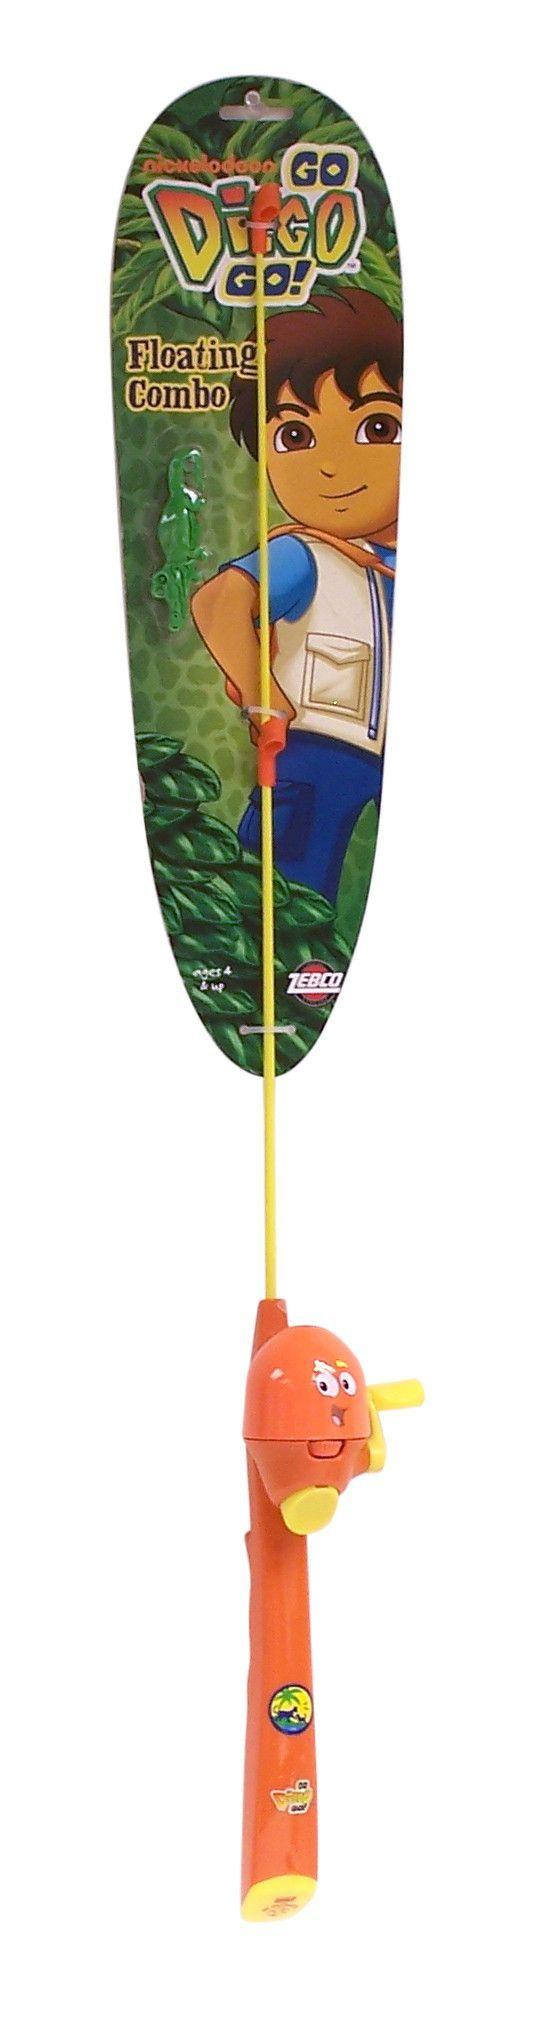 DIEGO FLOATING COMBO - ZEB-DIEGOFG-06-FB6 - by Zebco Sales Co. LLC